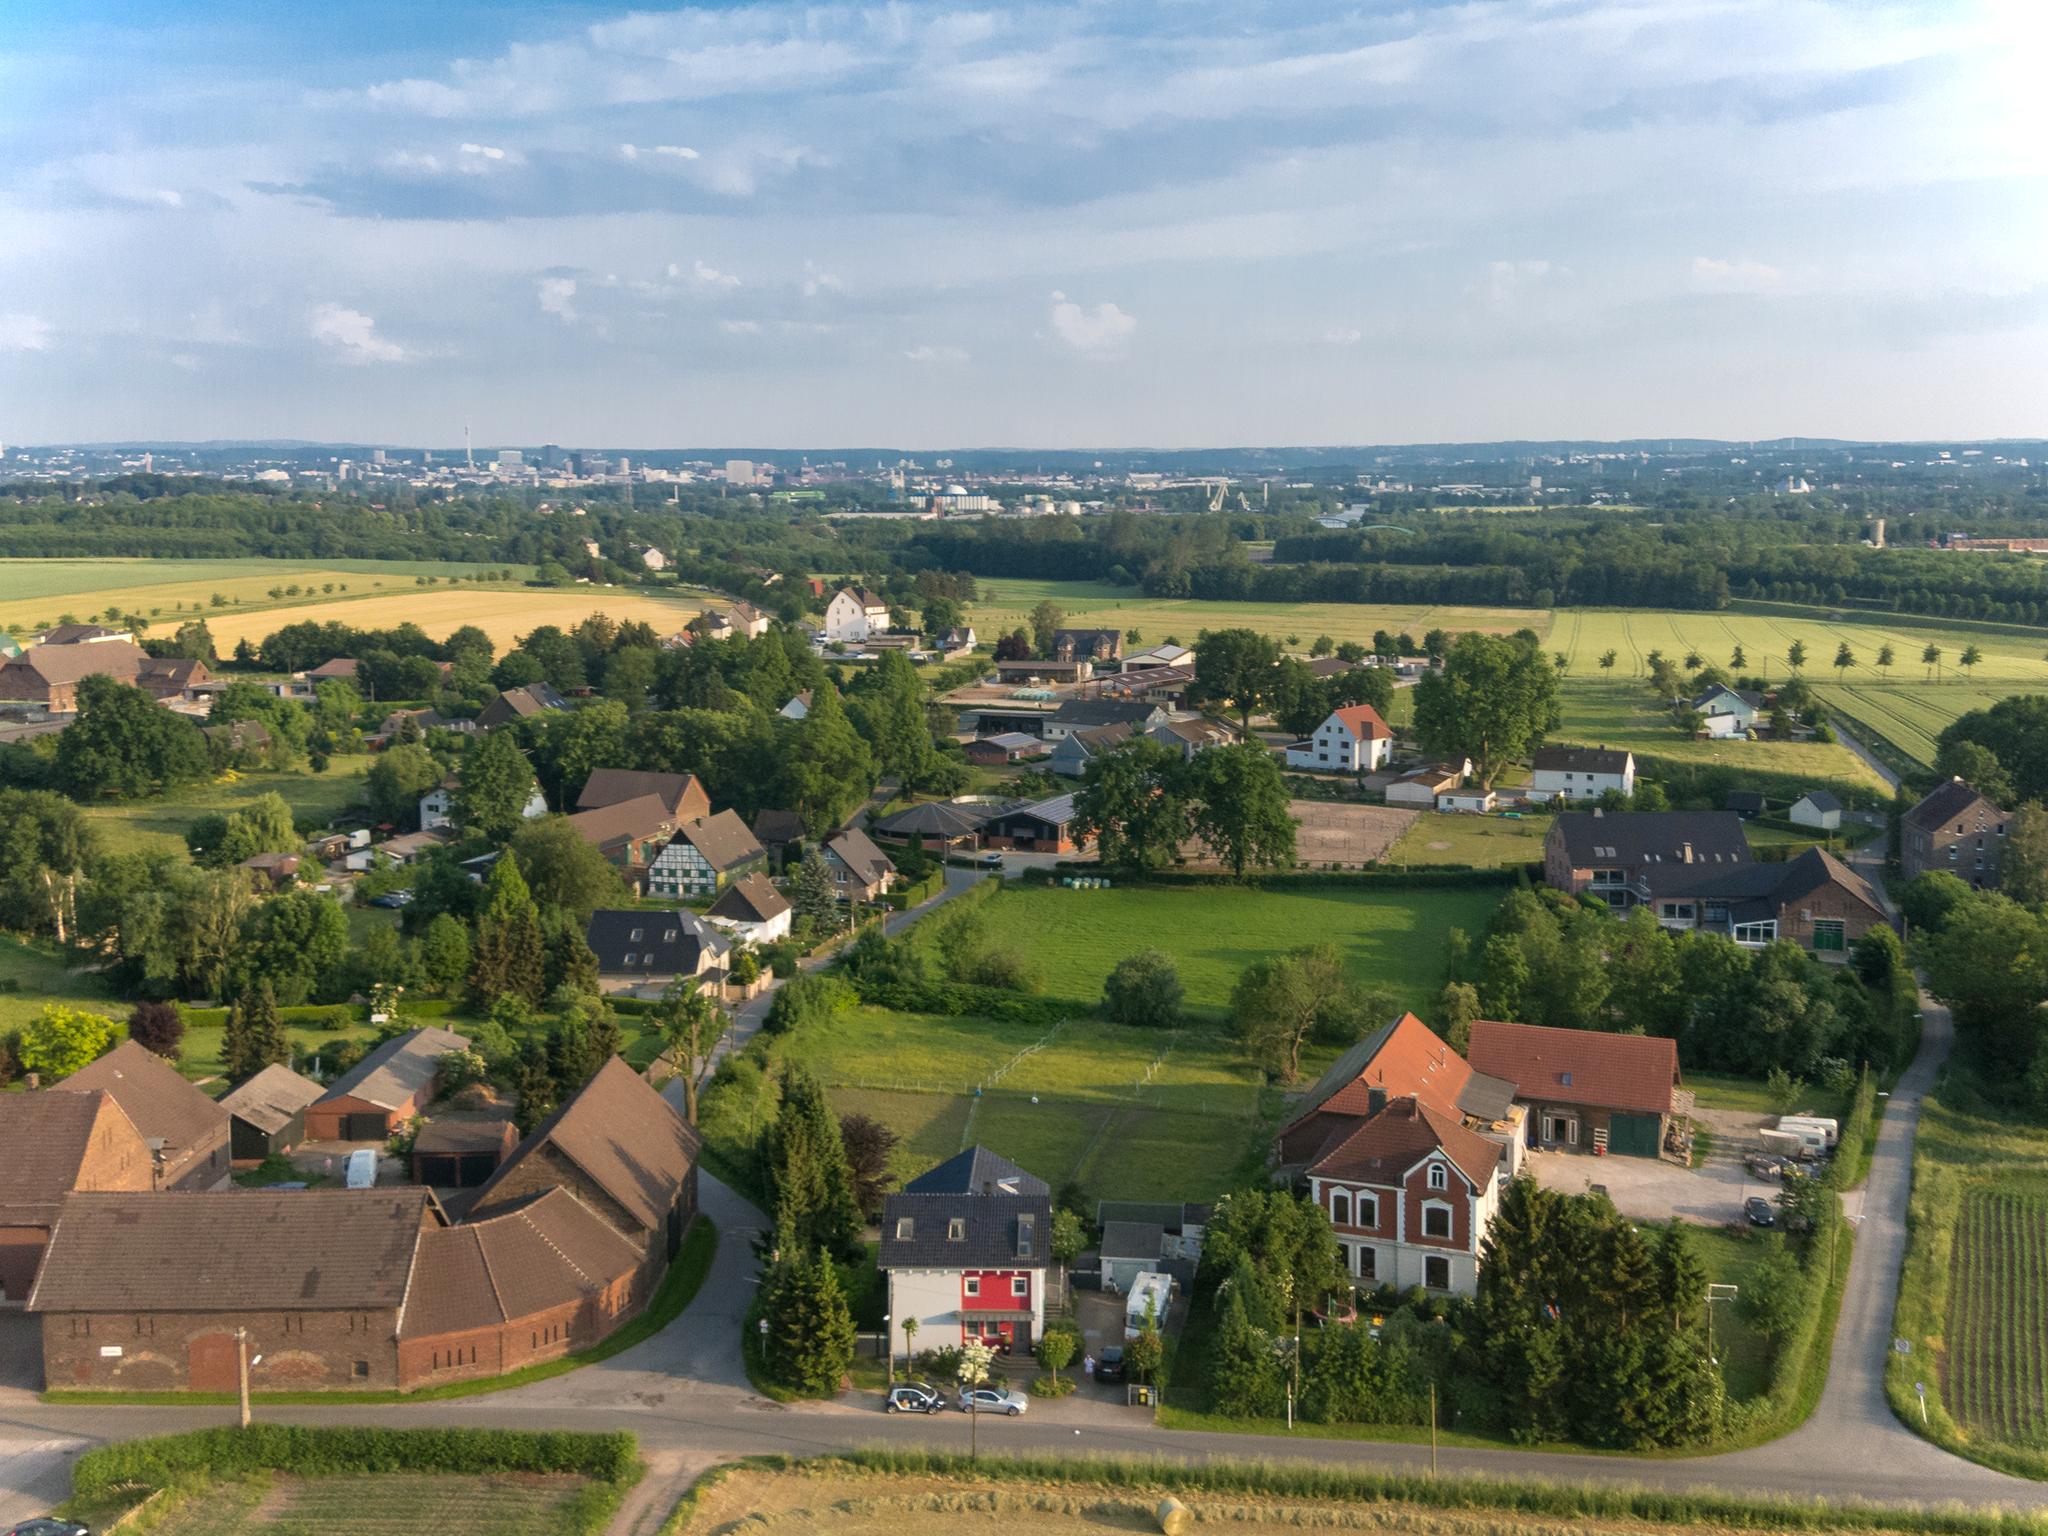 Der Dortmunder Norden by Peter Laudanski